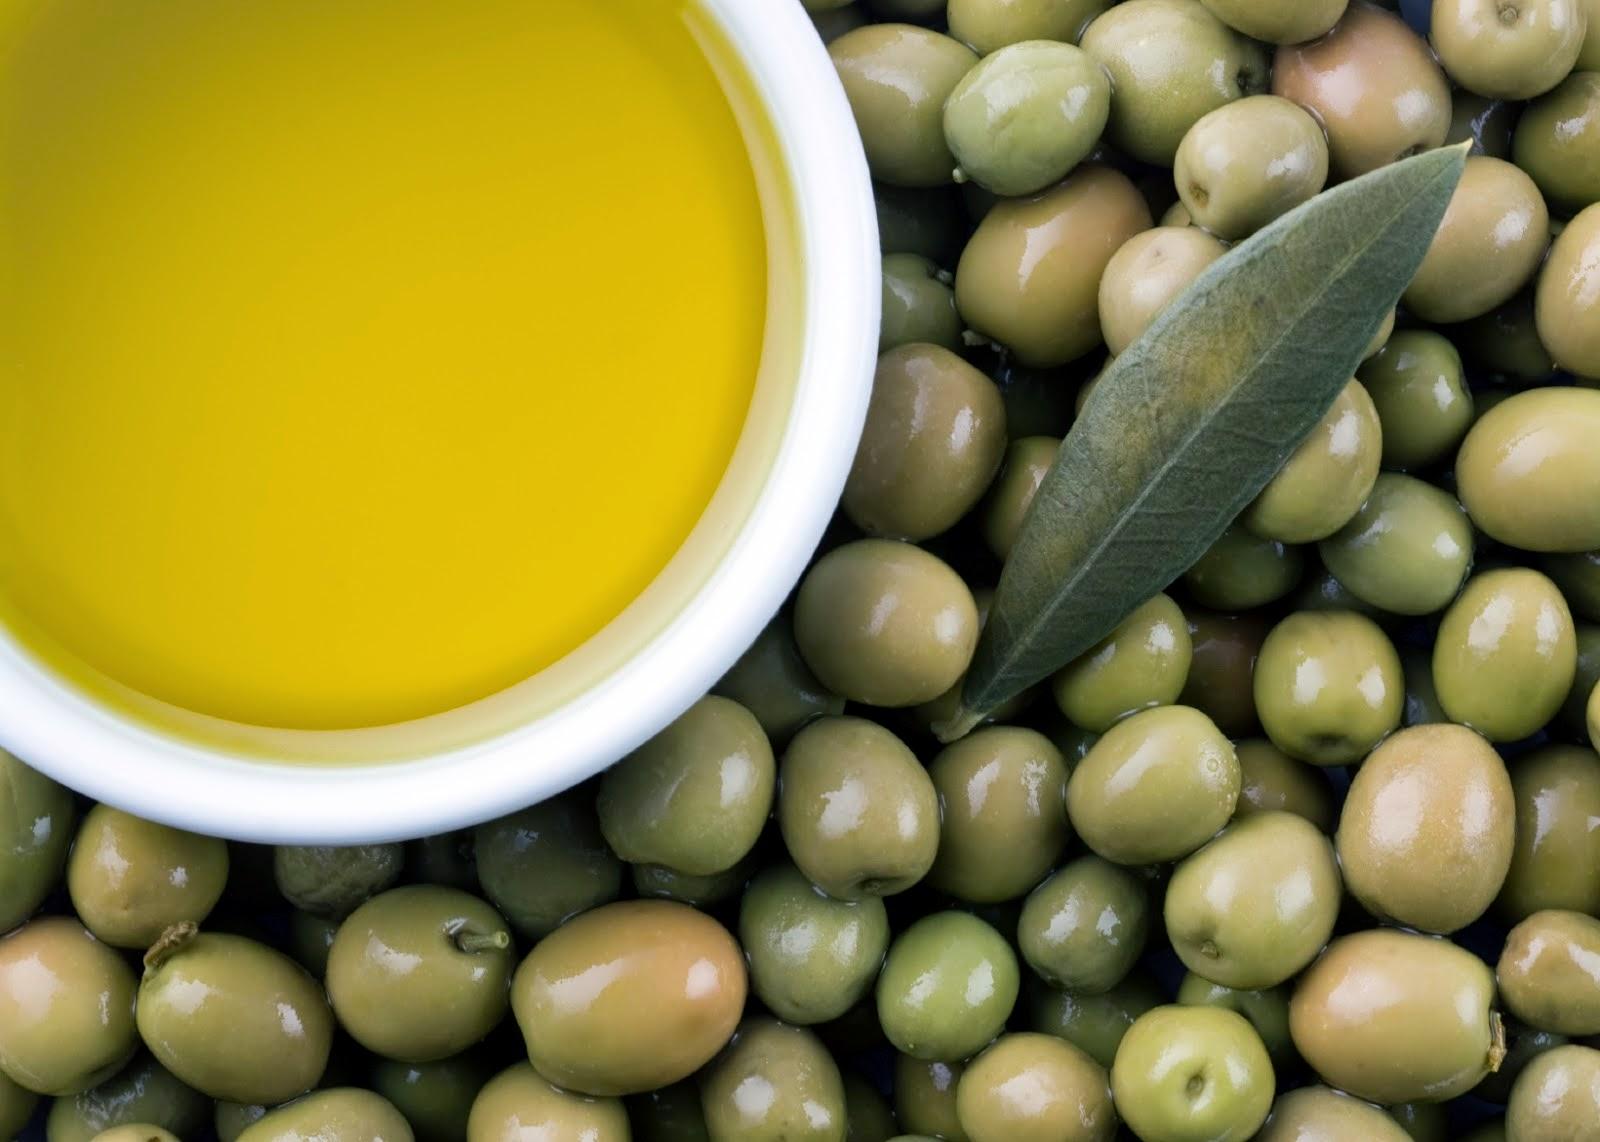 Manfaat minyak zaitun untuk perawatan kulit